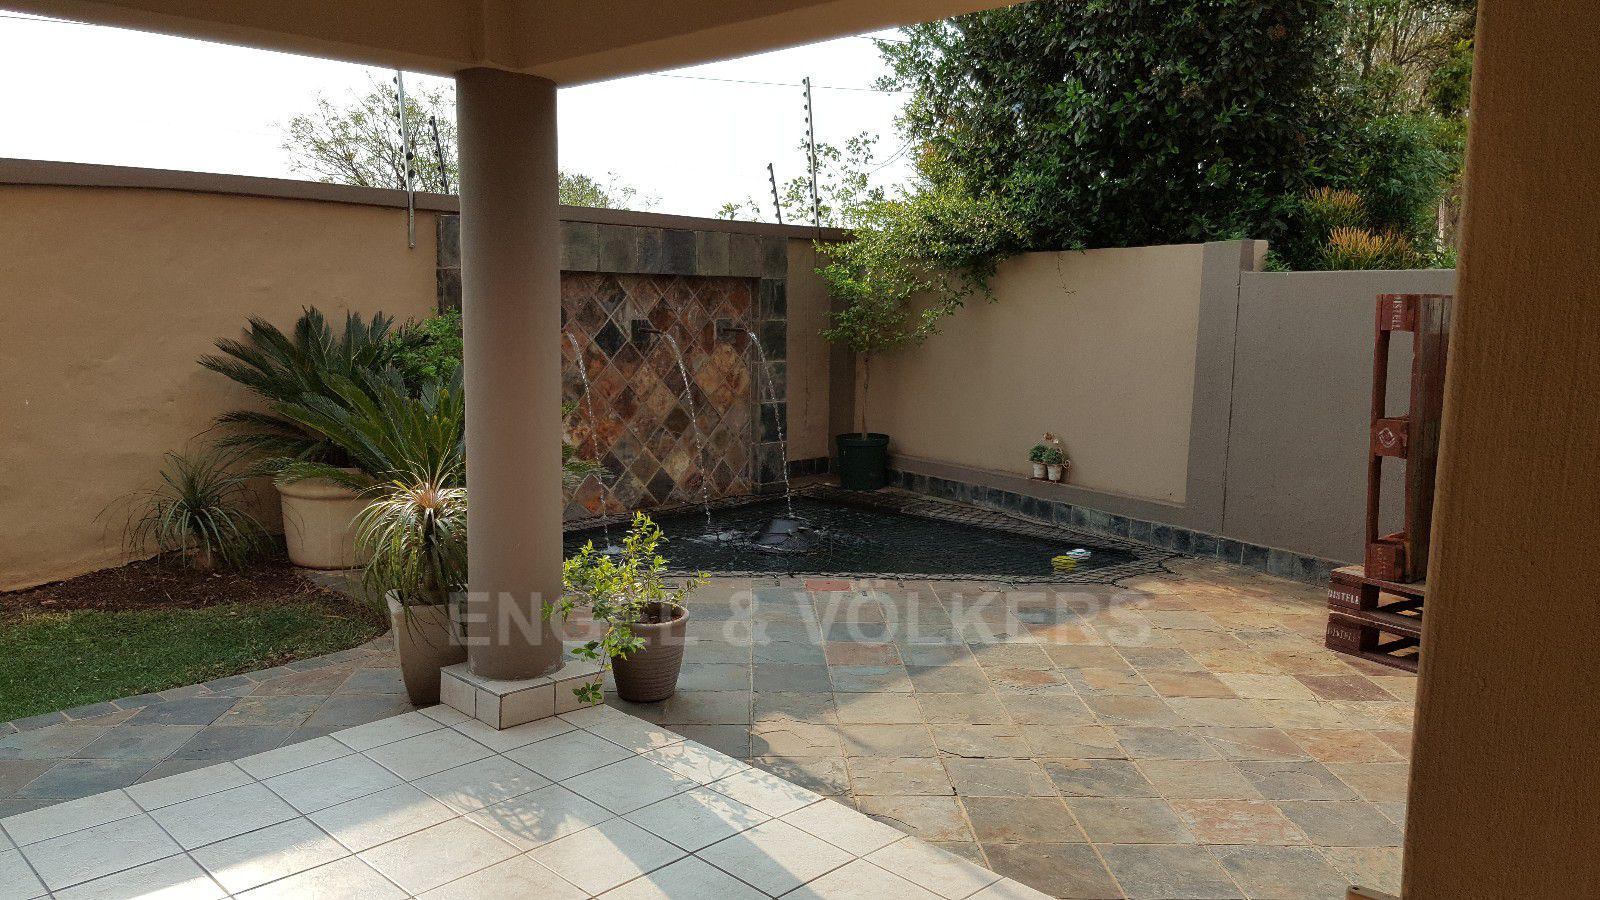 Irene View Estate property for sale. Ref No: 13388279. Picture no 6